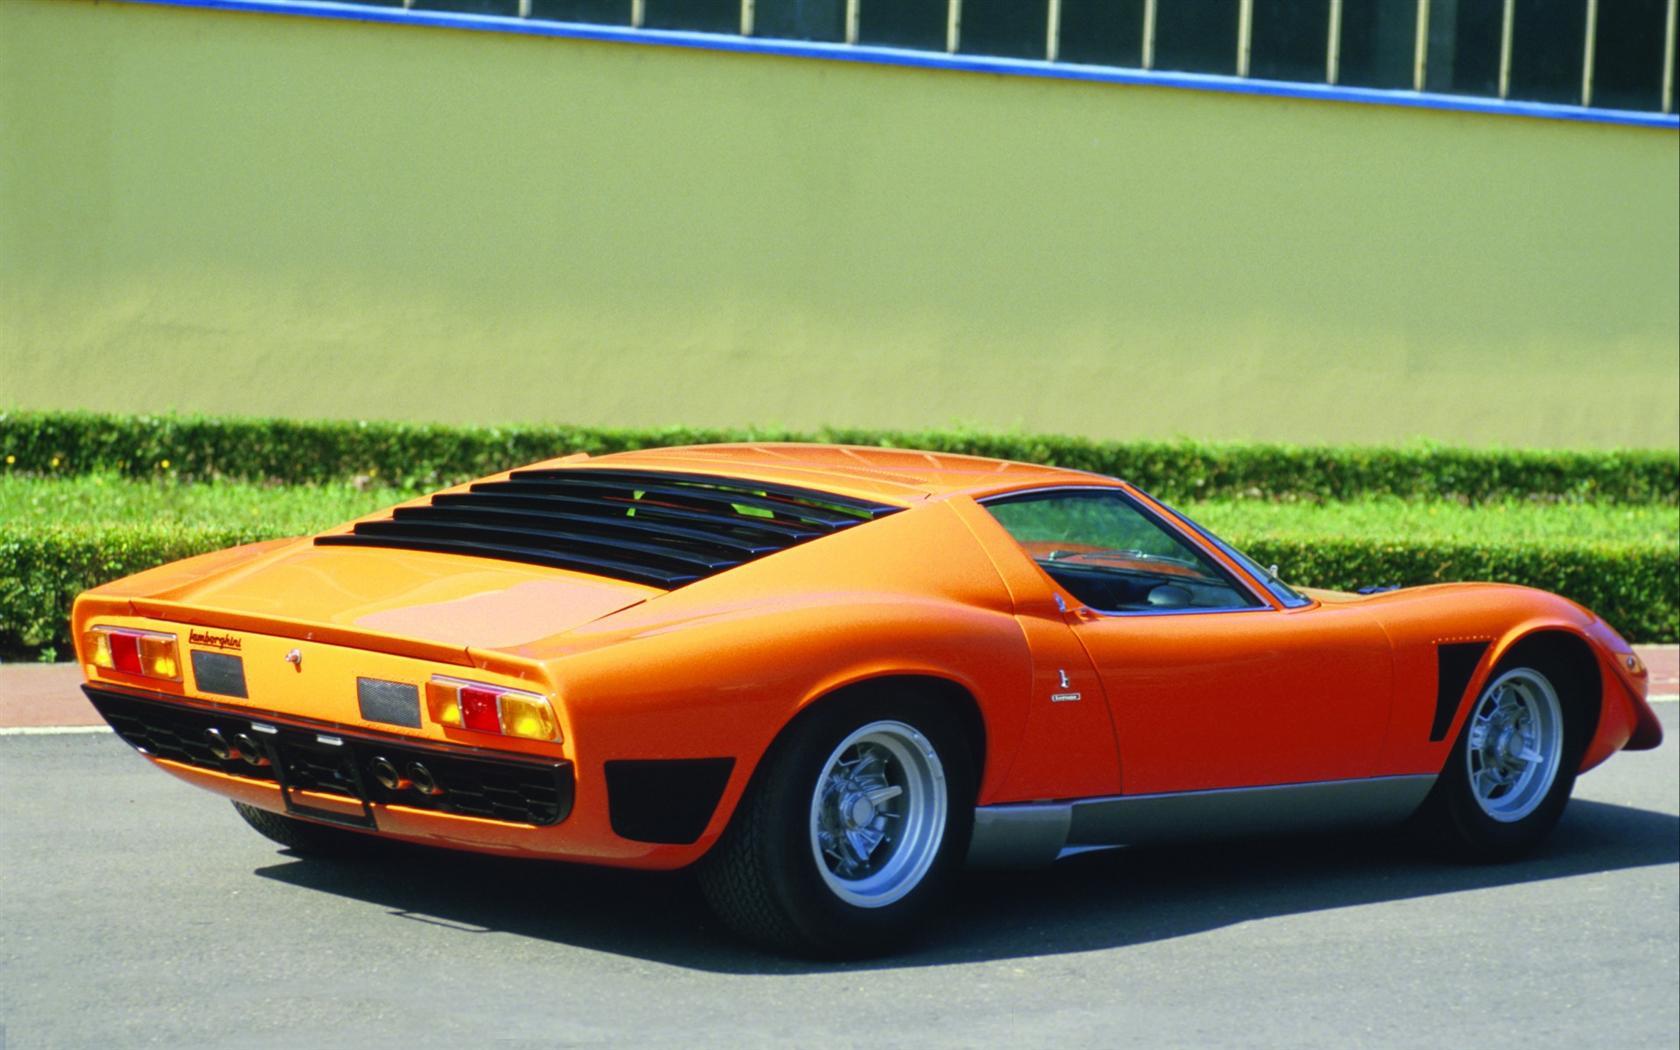 1970 Lamborghini Miura P400s Image Https Www